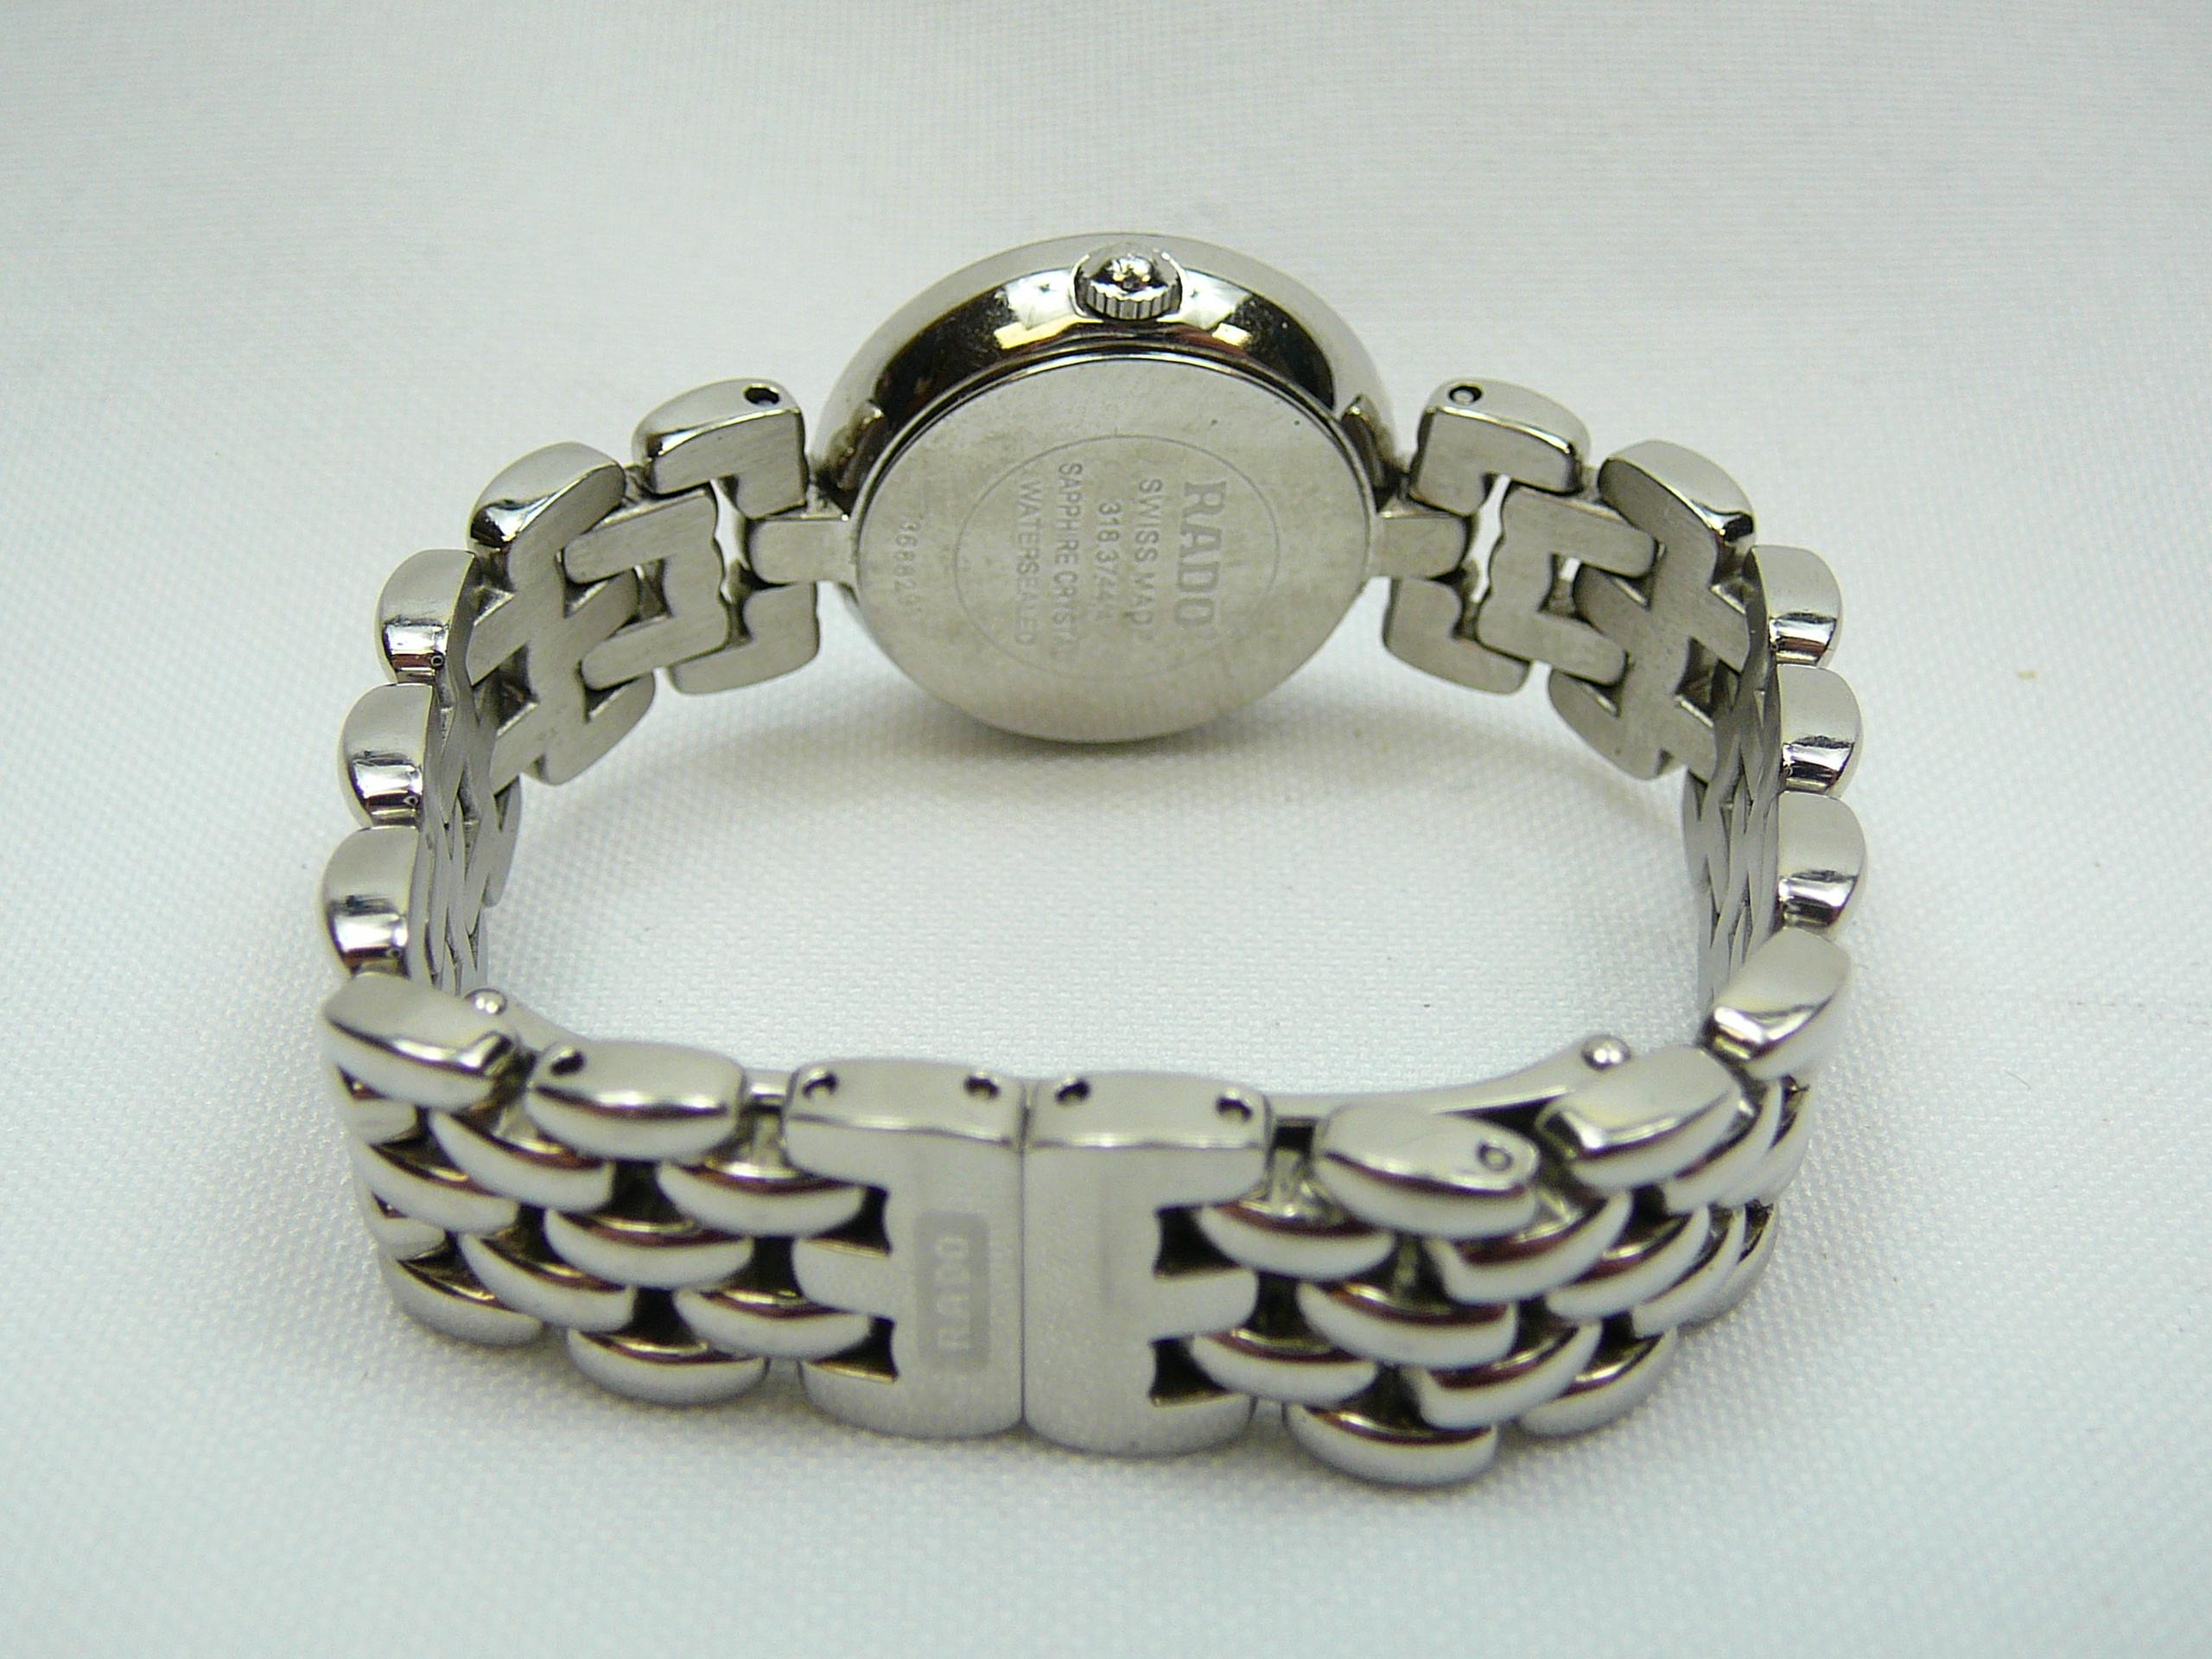 Ladies Rado Wrist Watch - Image 3 of 3